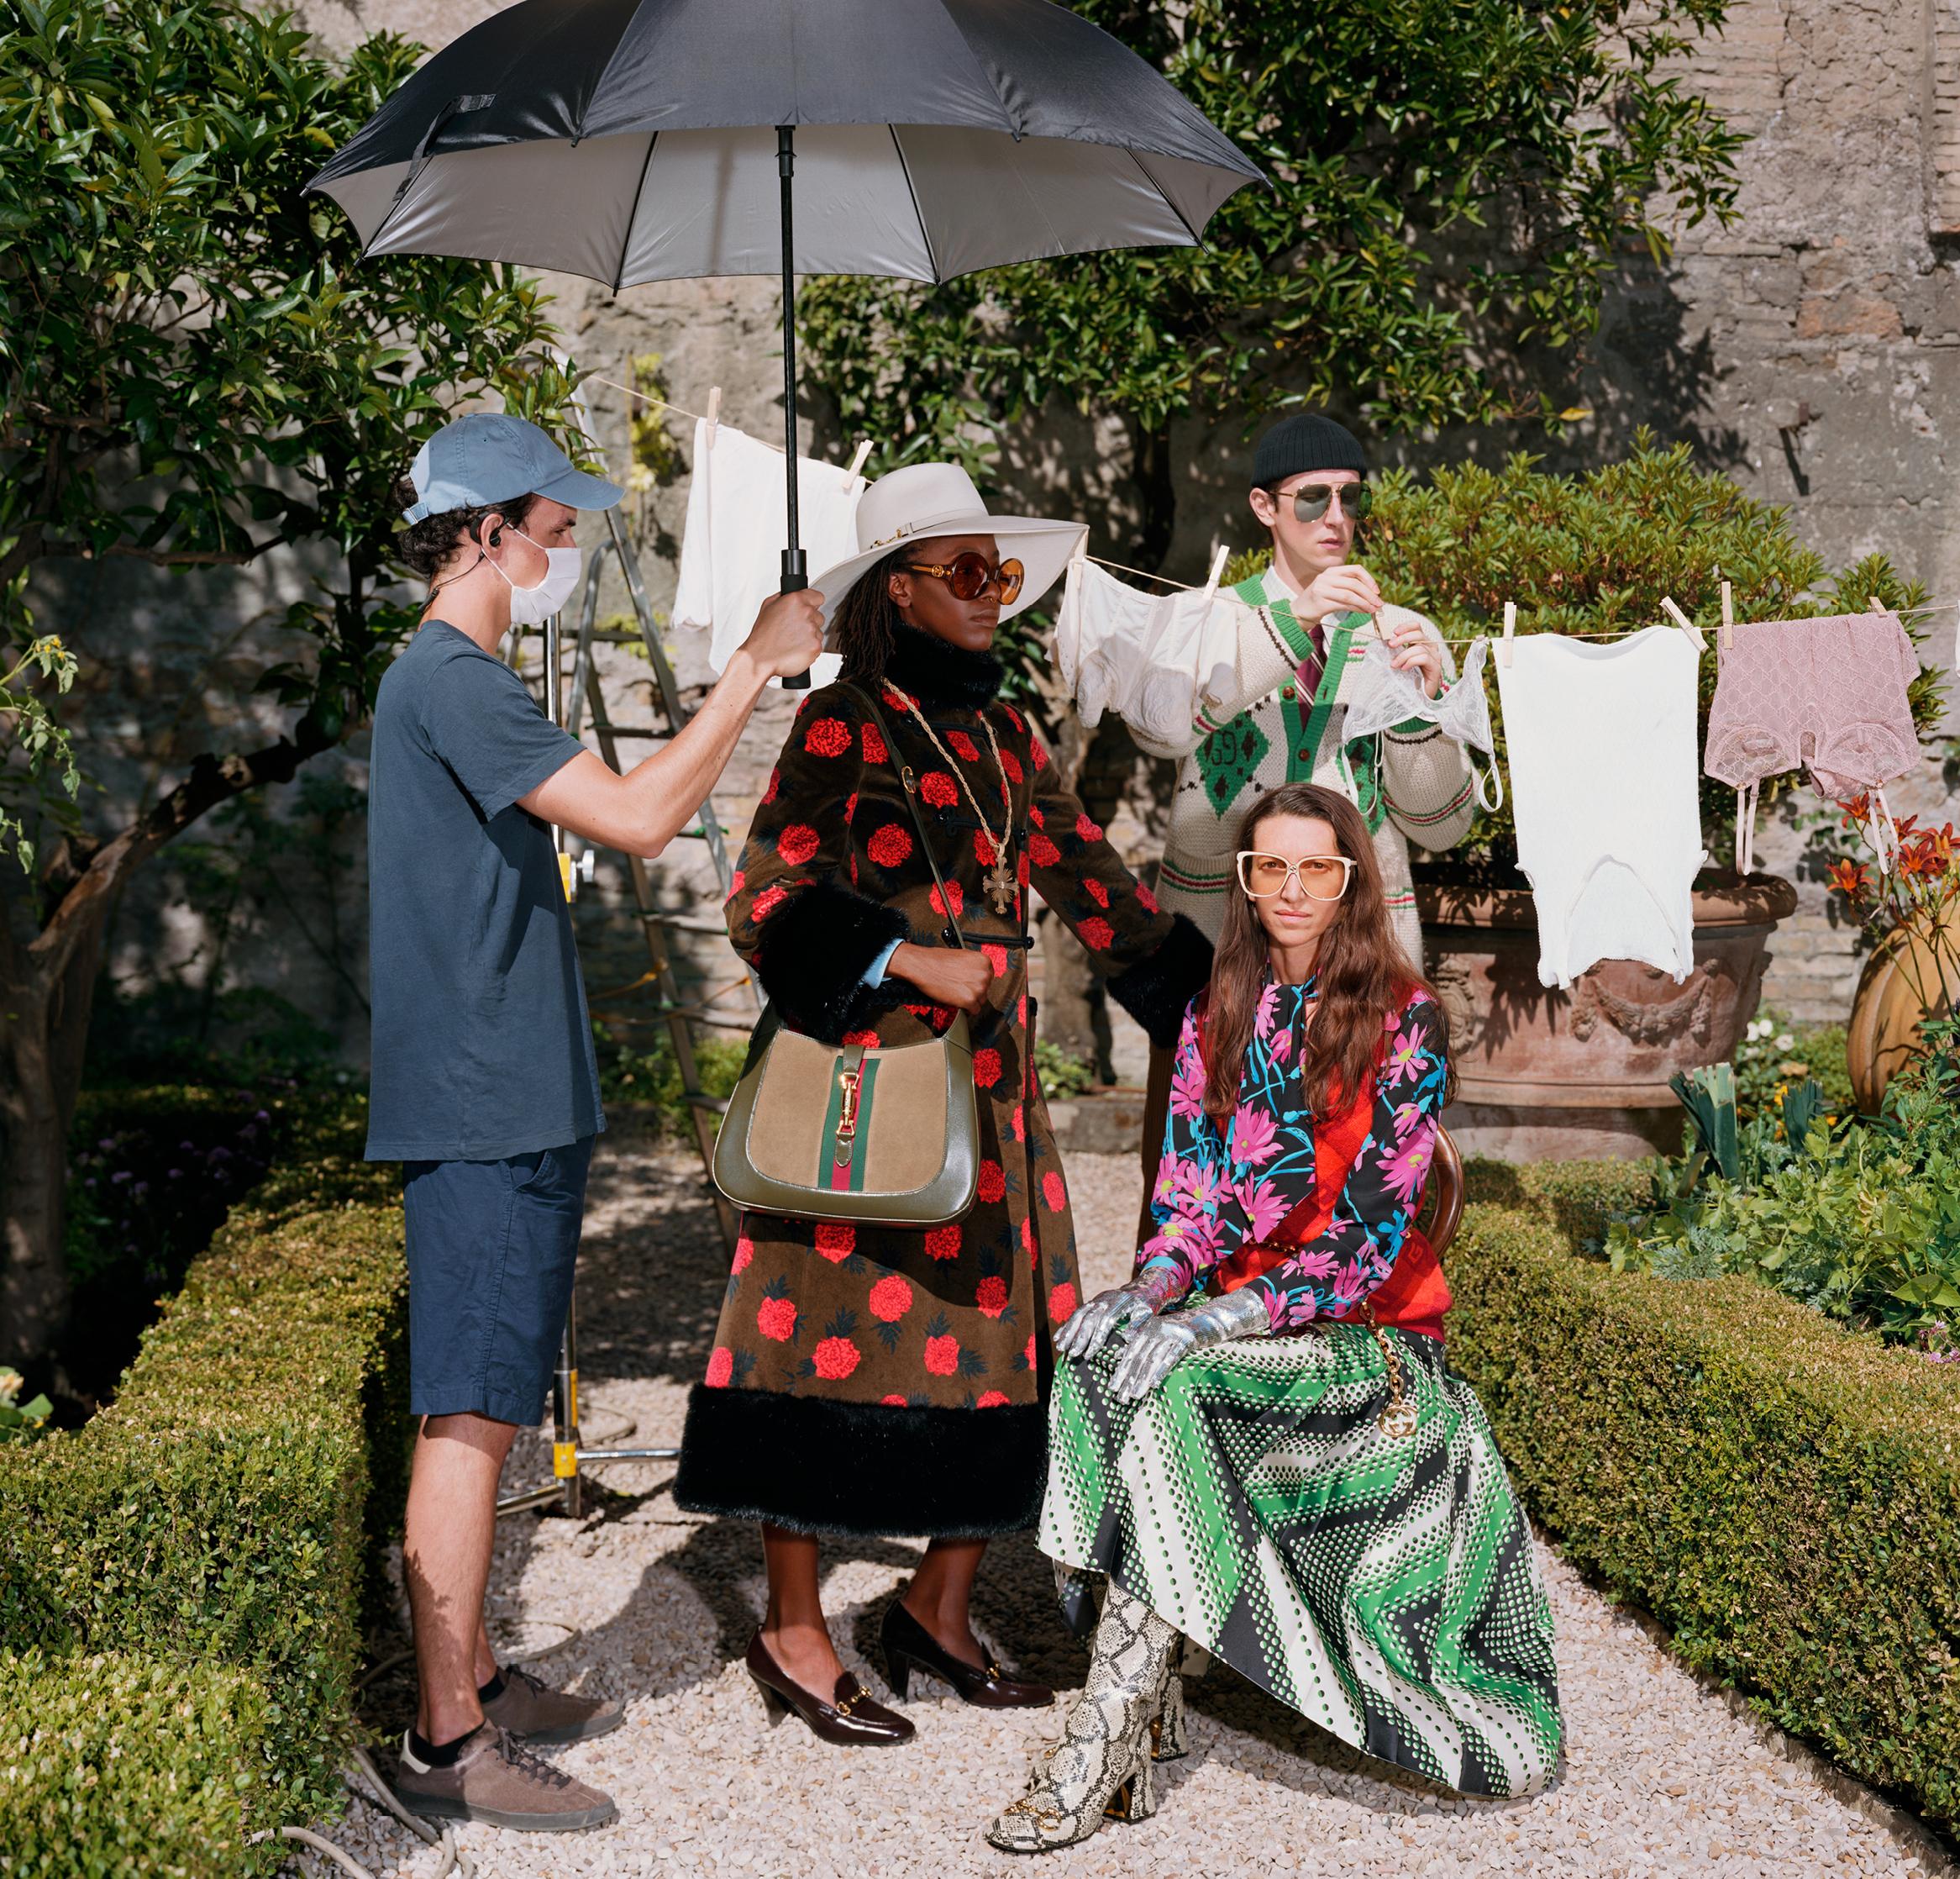 Gucci 'The Epilogue' Cruise 2021 Ad Campaign Film & Photos